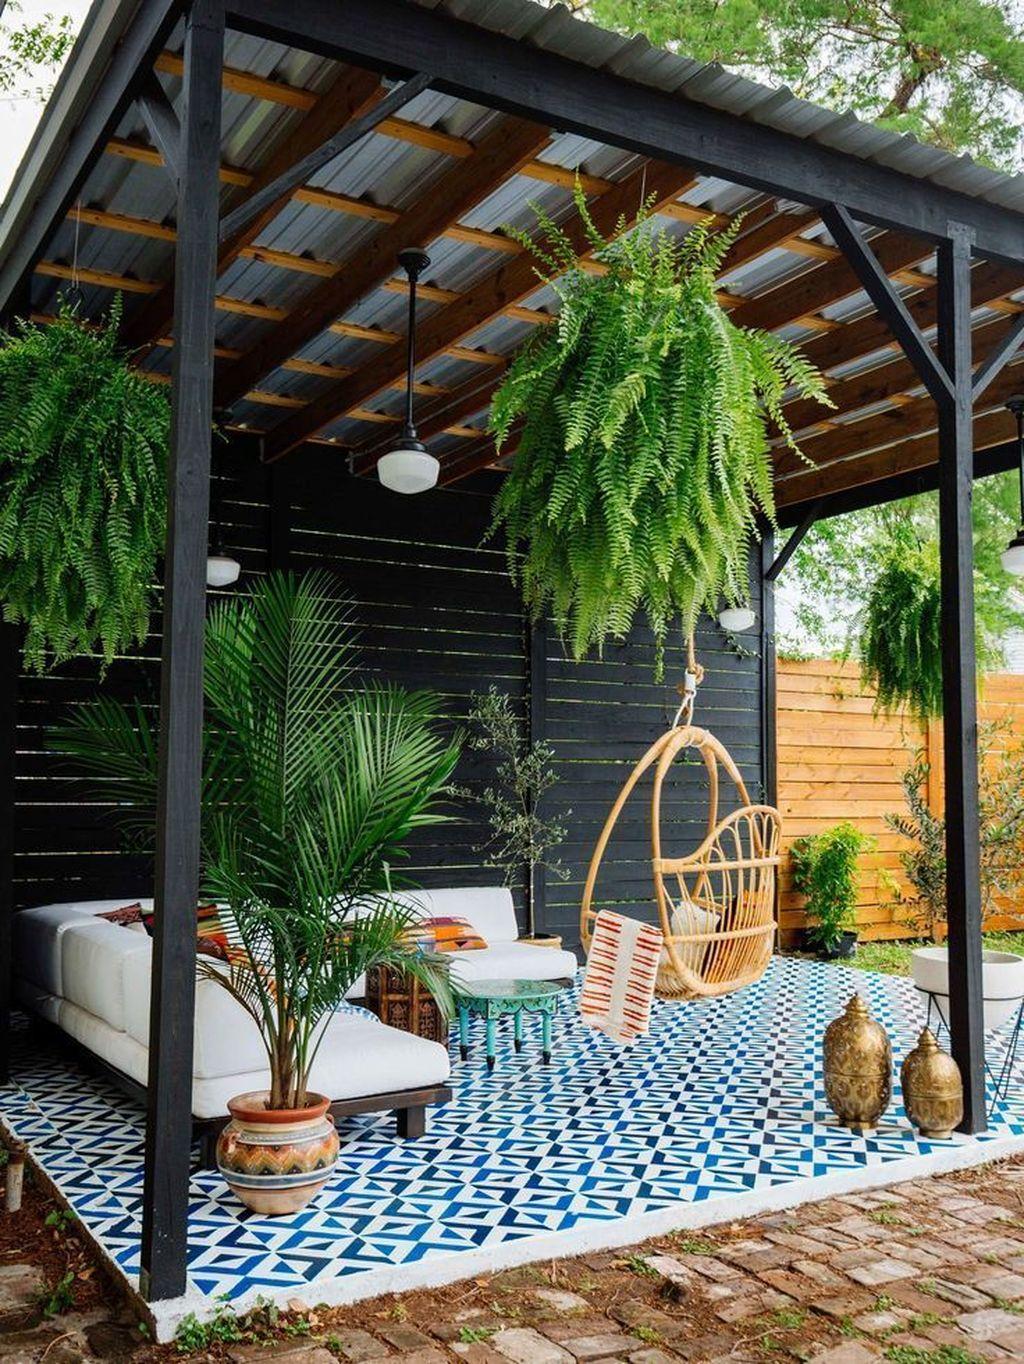 The Best Romantic Backyard Decorating Ideas 25